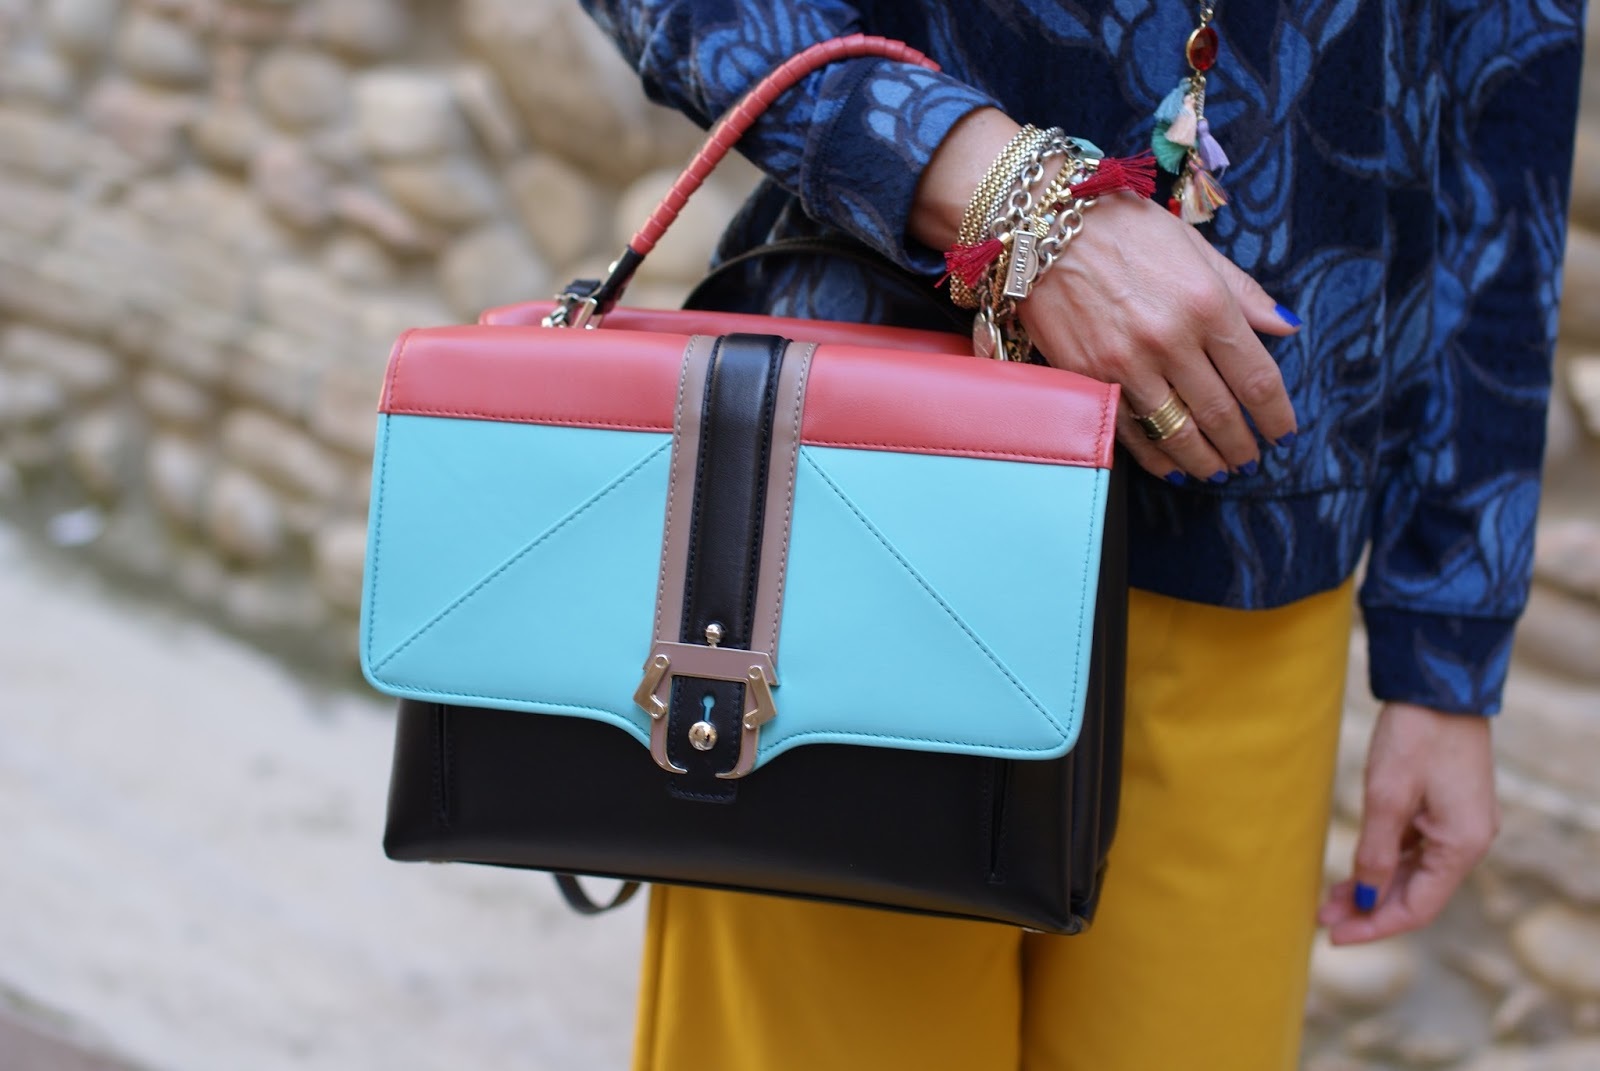 Paula Cademartori Faye on sale, tassels necklace and bracelet, Chanel vibrato nail polish on Fashion and Cookies fashion blog